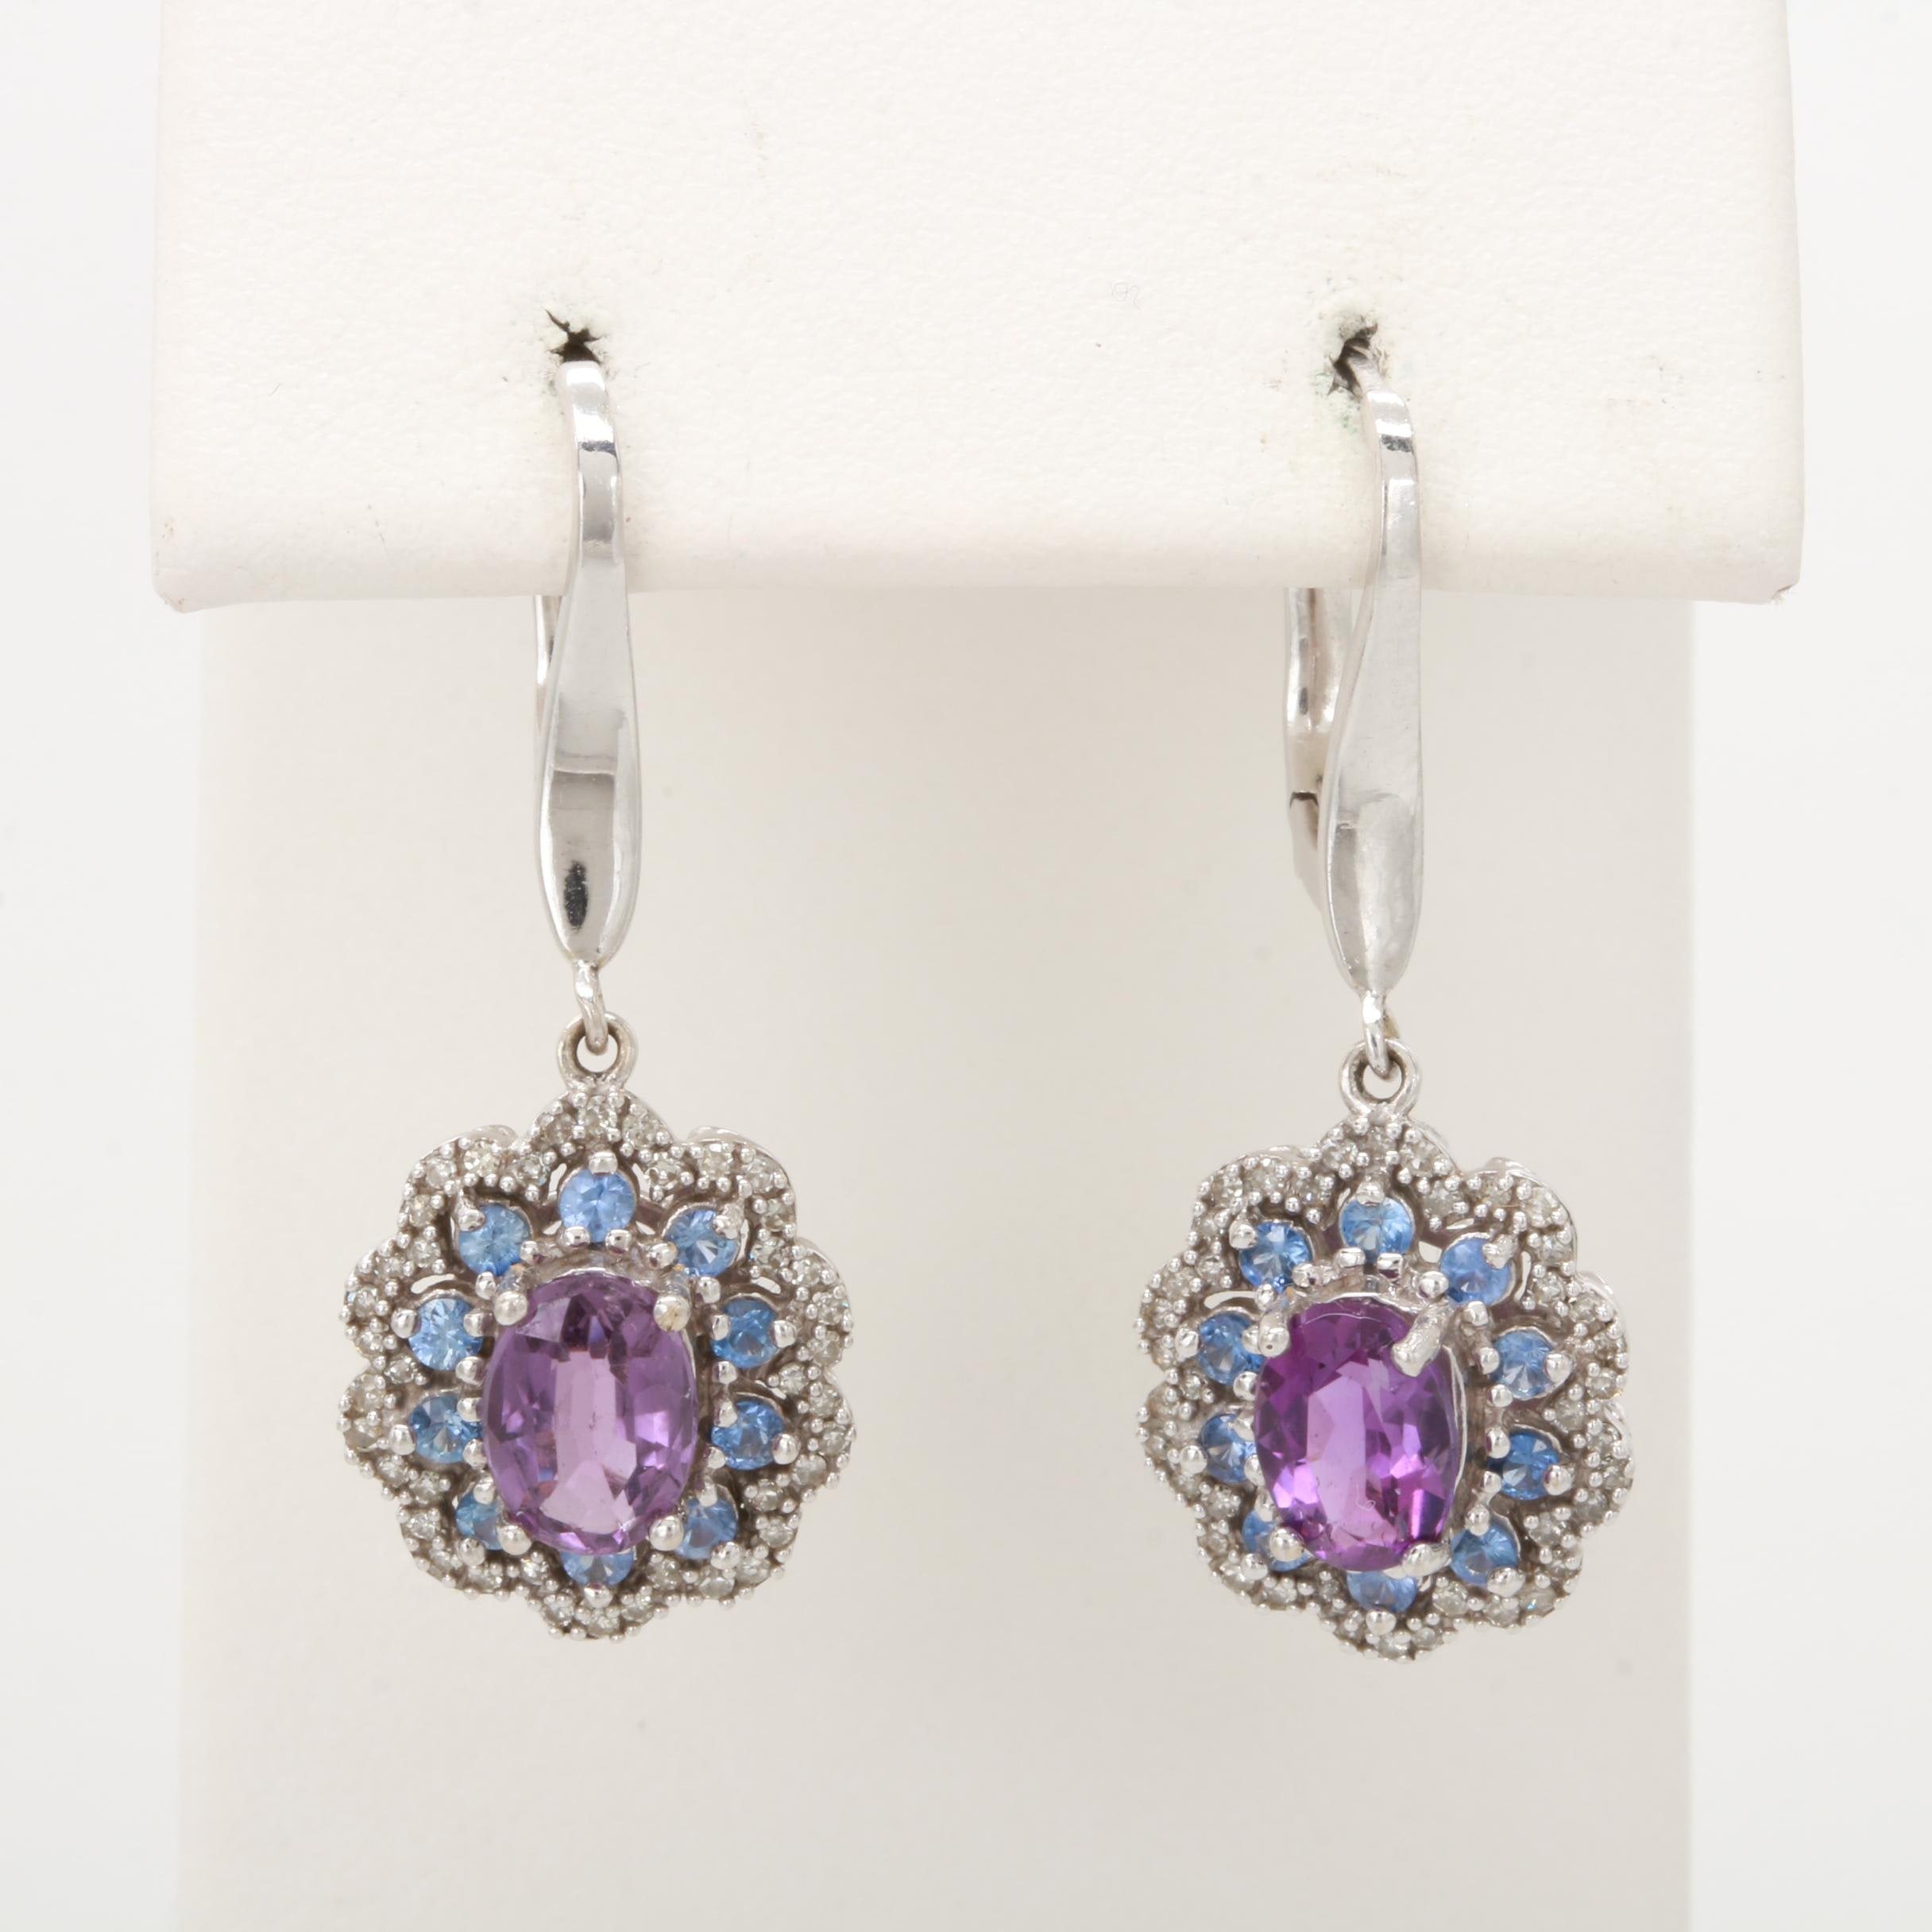 14K White Gold Amethyst, Blue Sapphire and Diamond Earrings